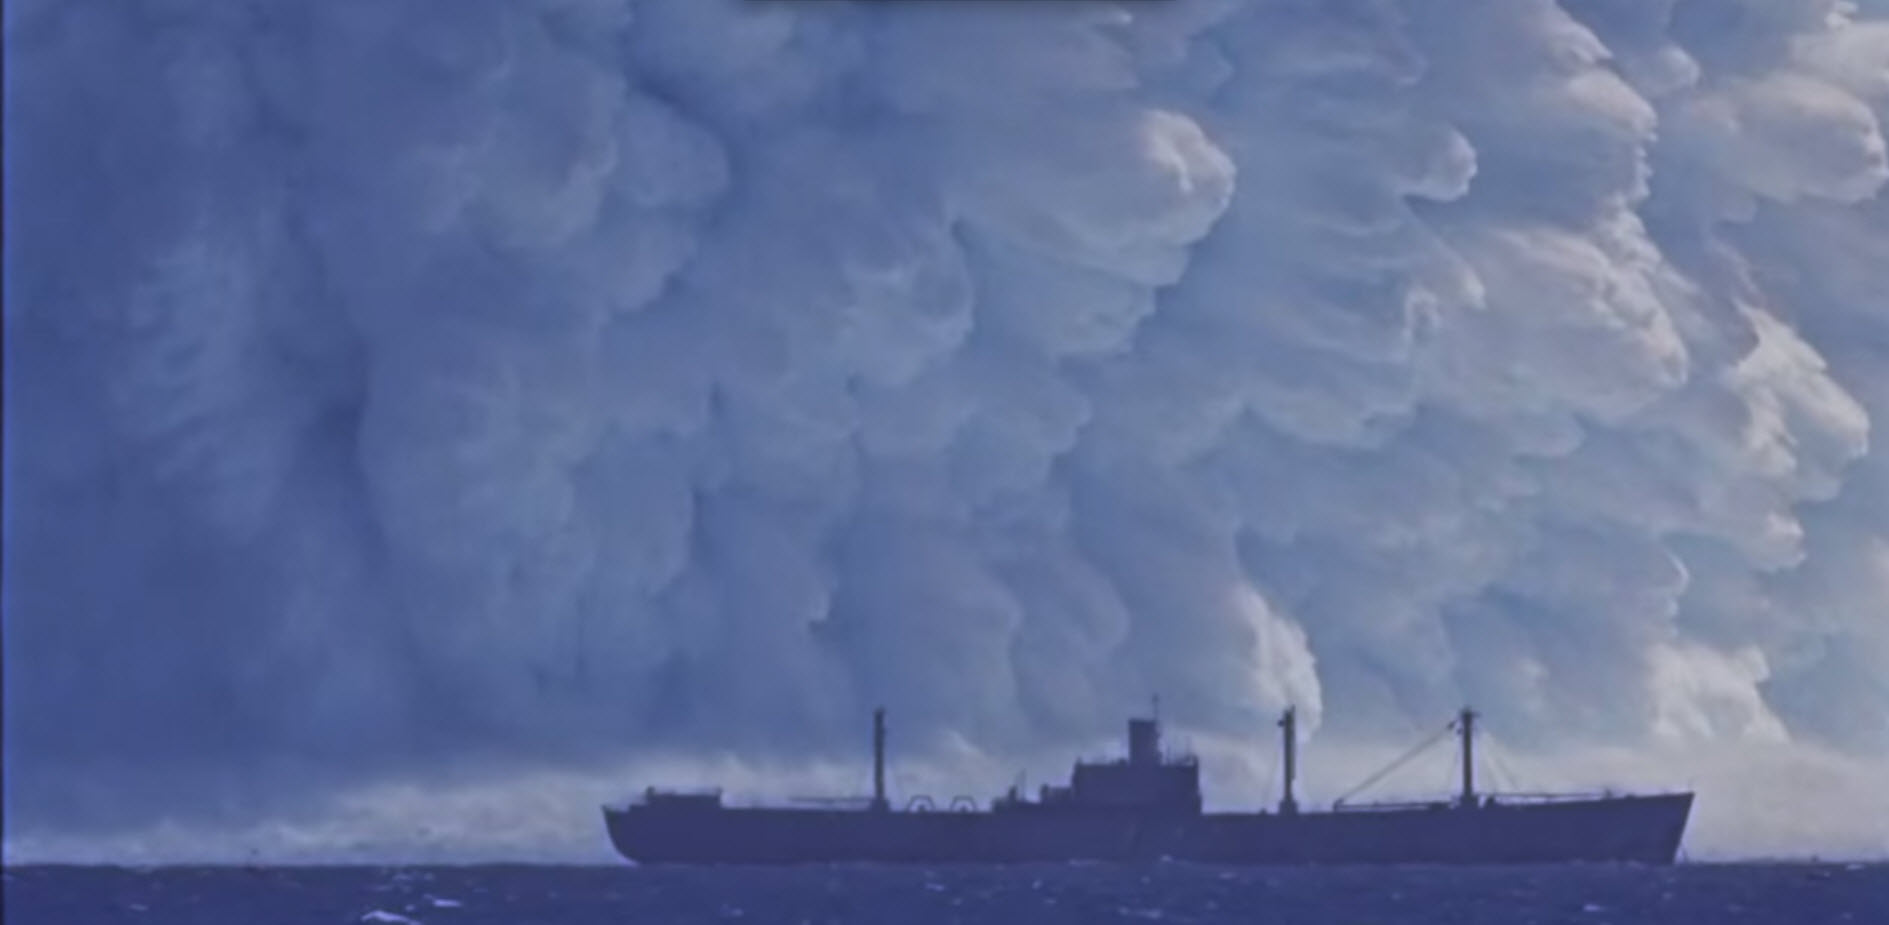 Underwater Nuke Ship